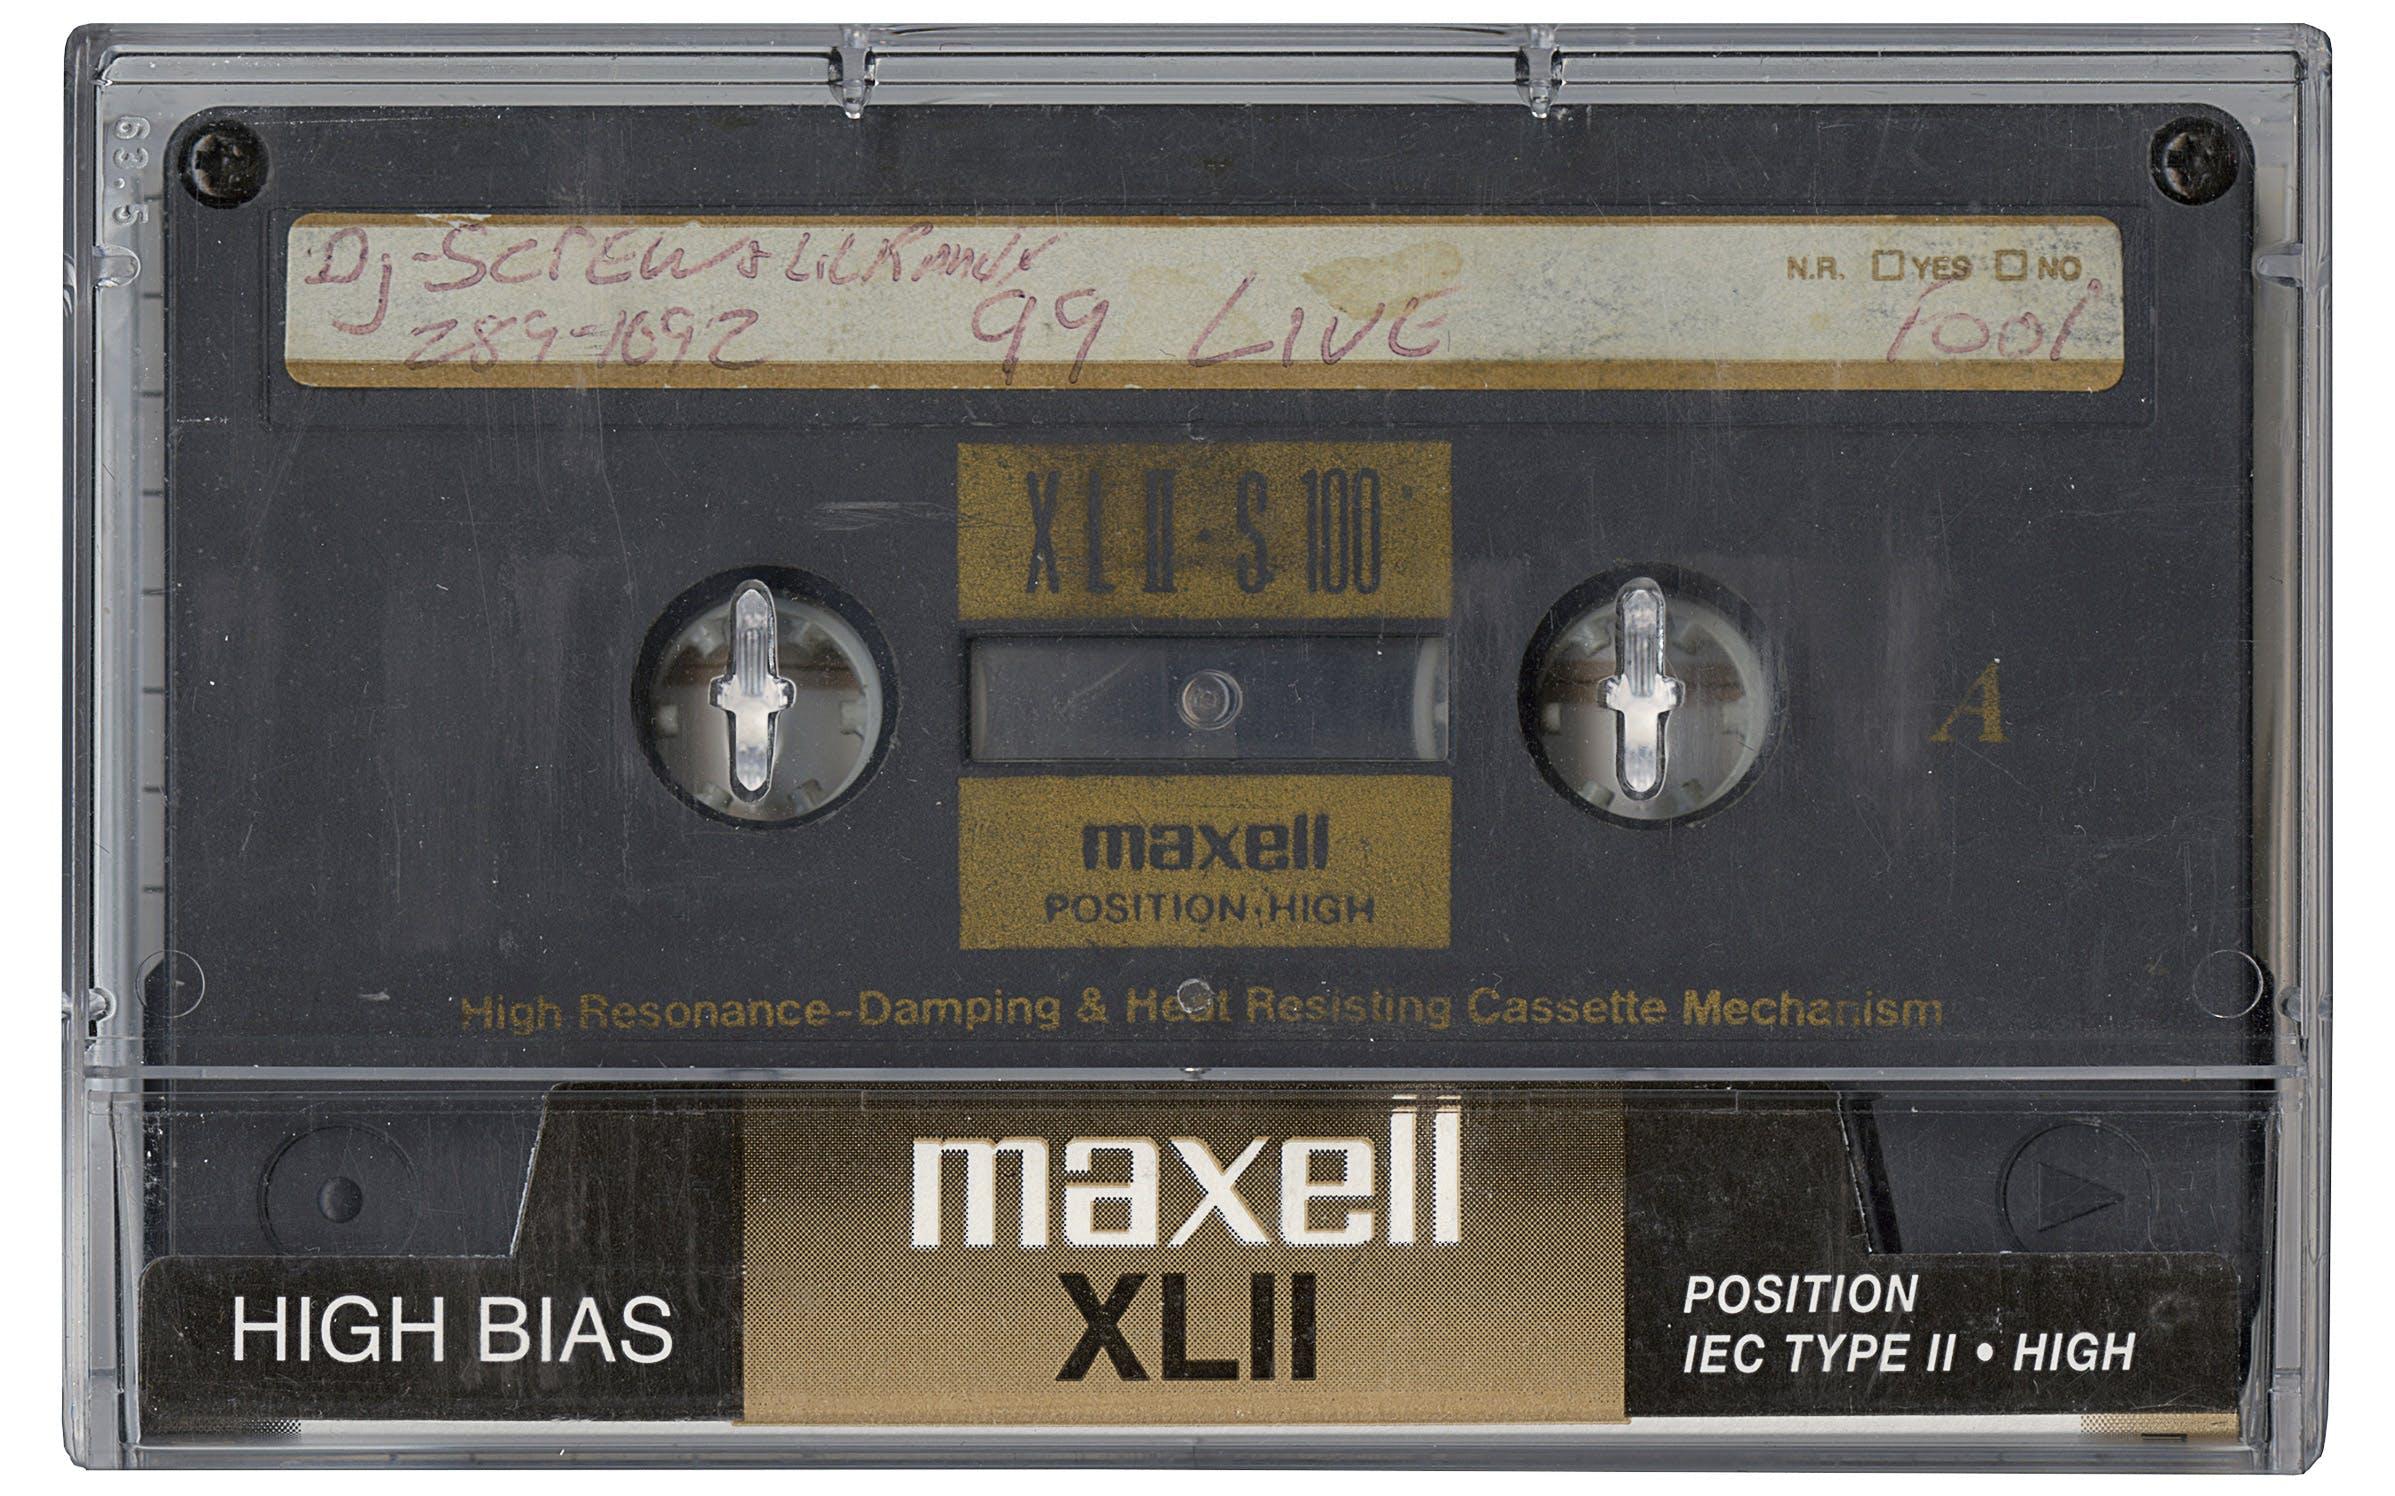 DJ Screw grey tape.